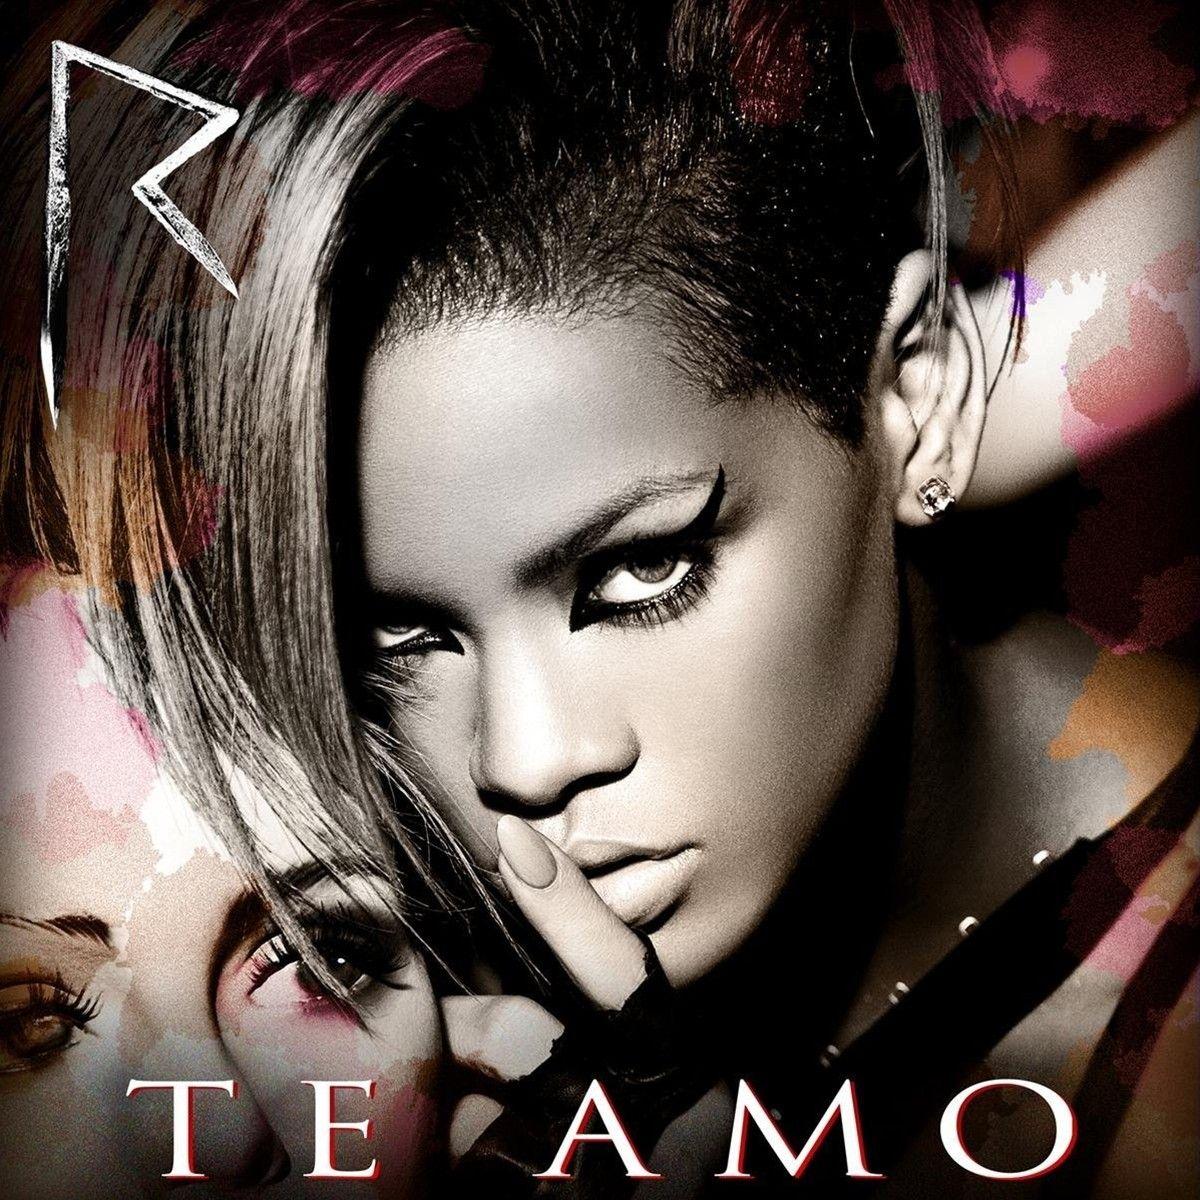 Te Amo With Images Rihanna Song Rihanna Album Cover Rihanna